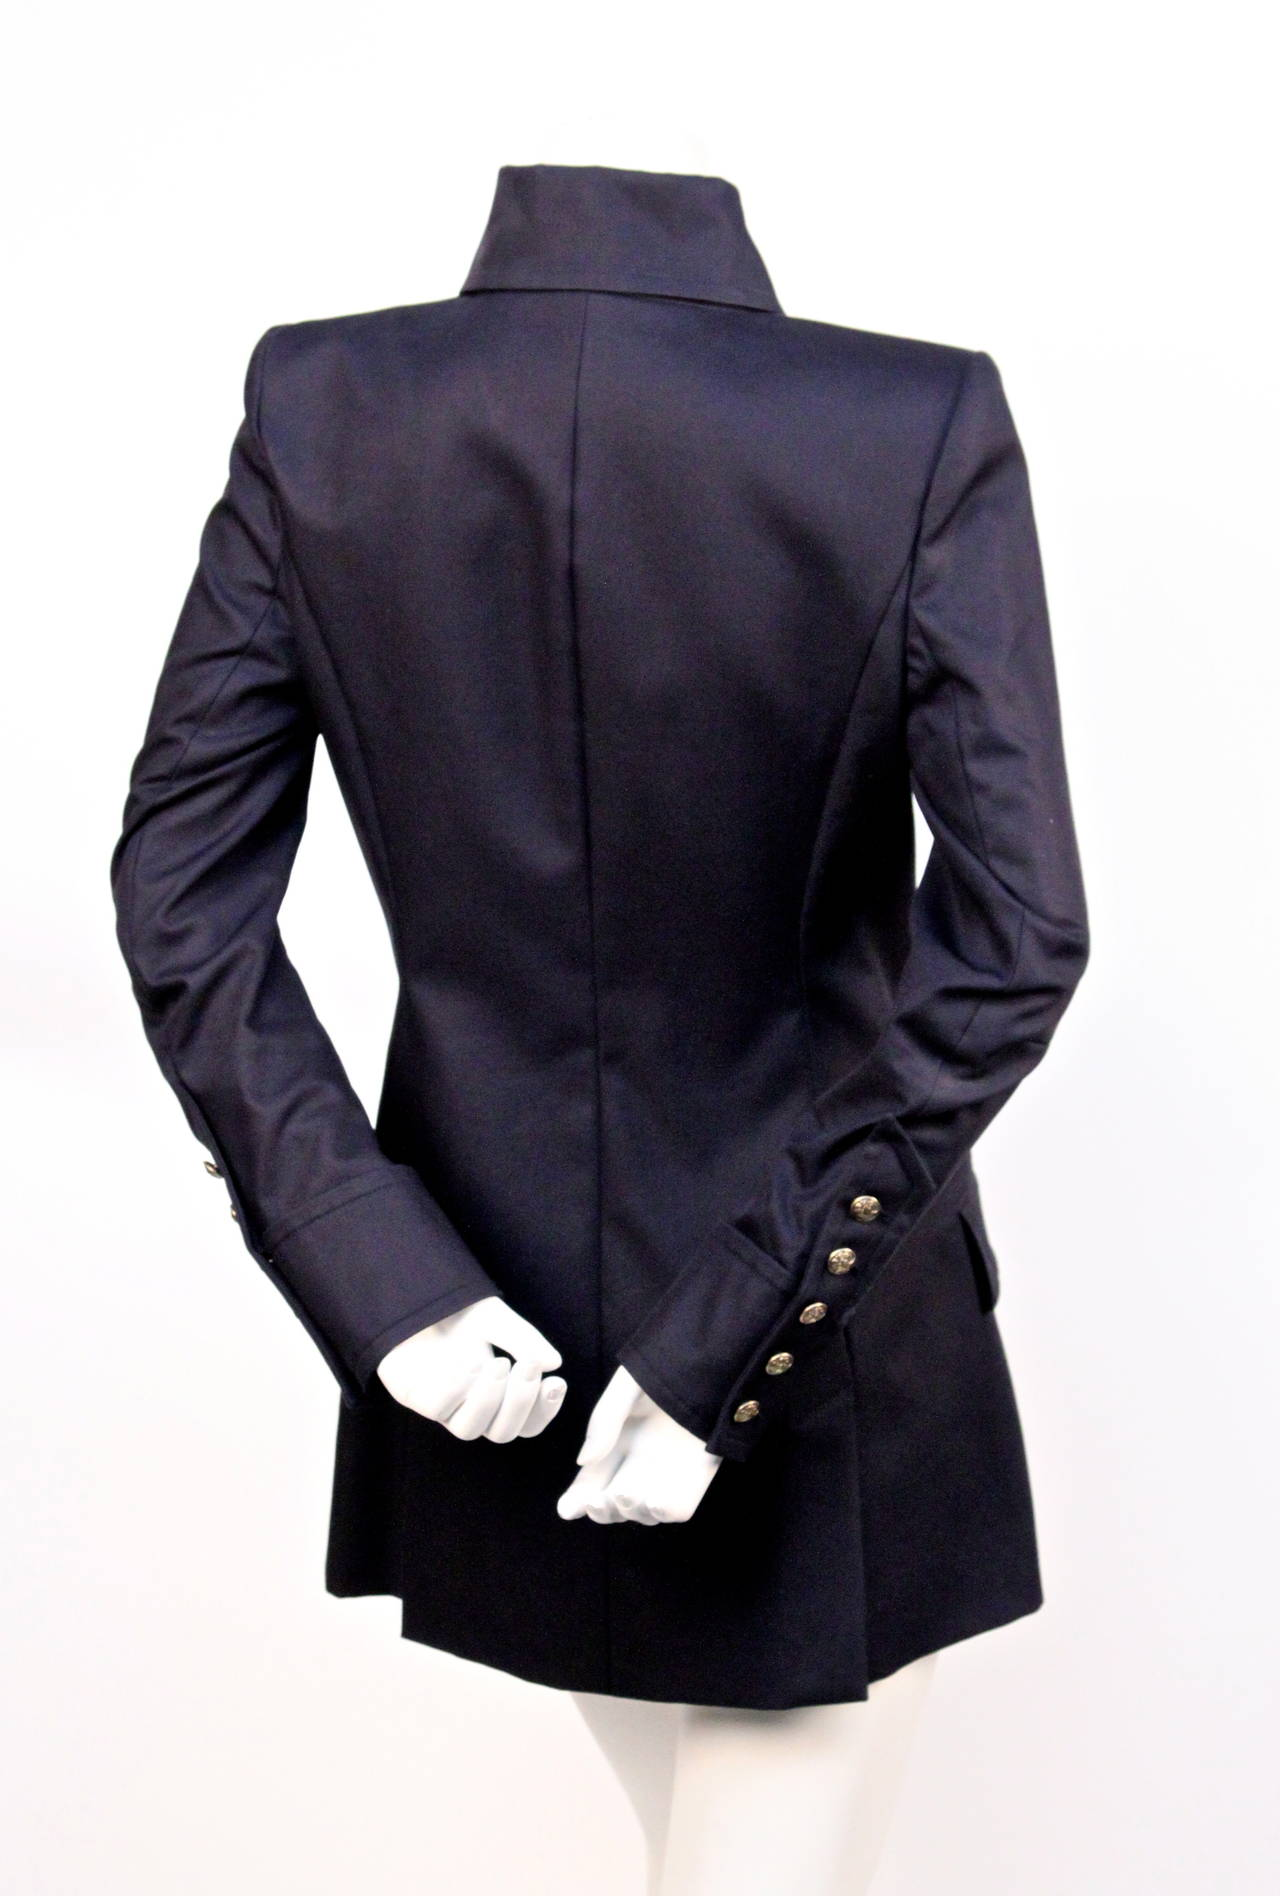 new BALMAIN navy blue tailored blazer jacket  3